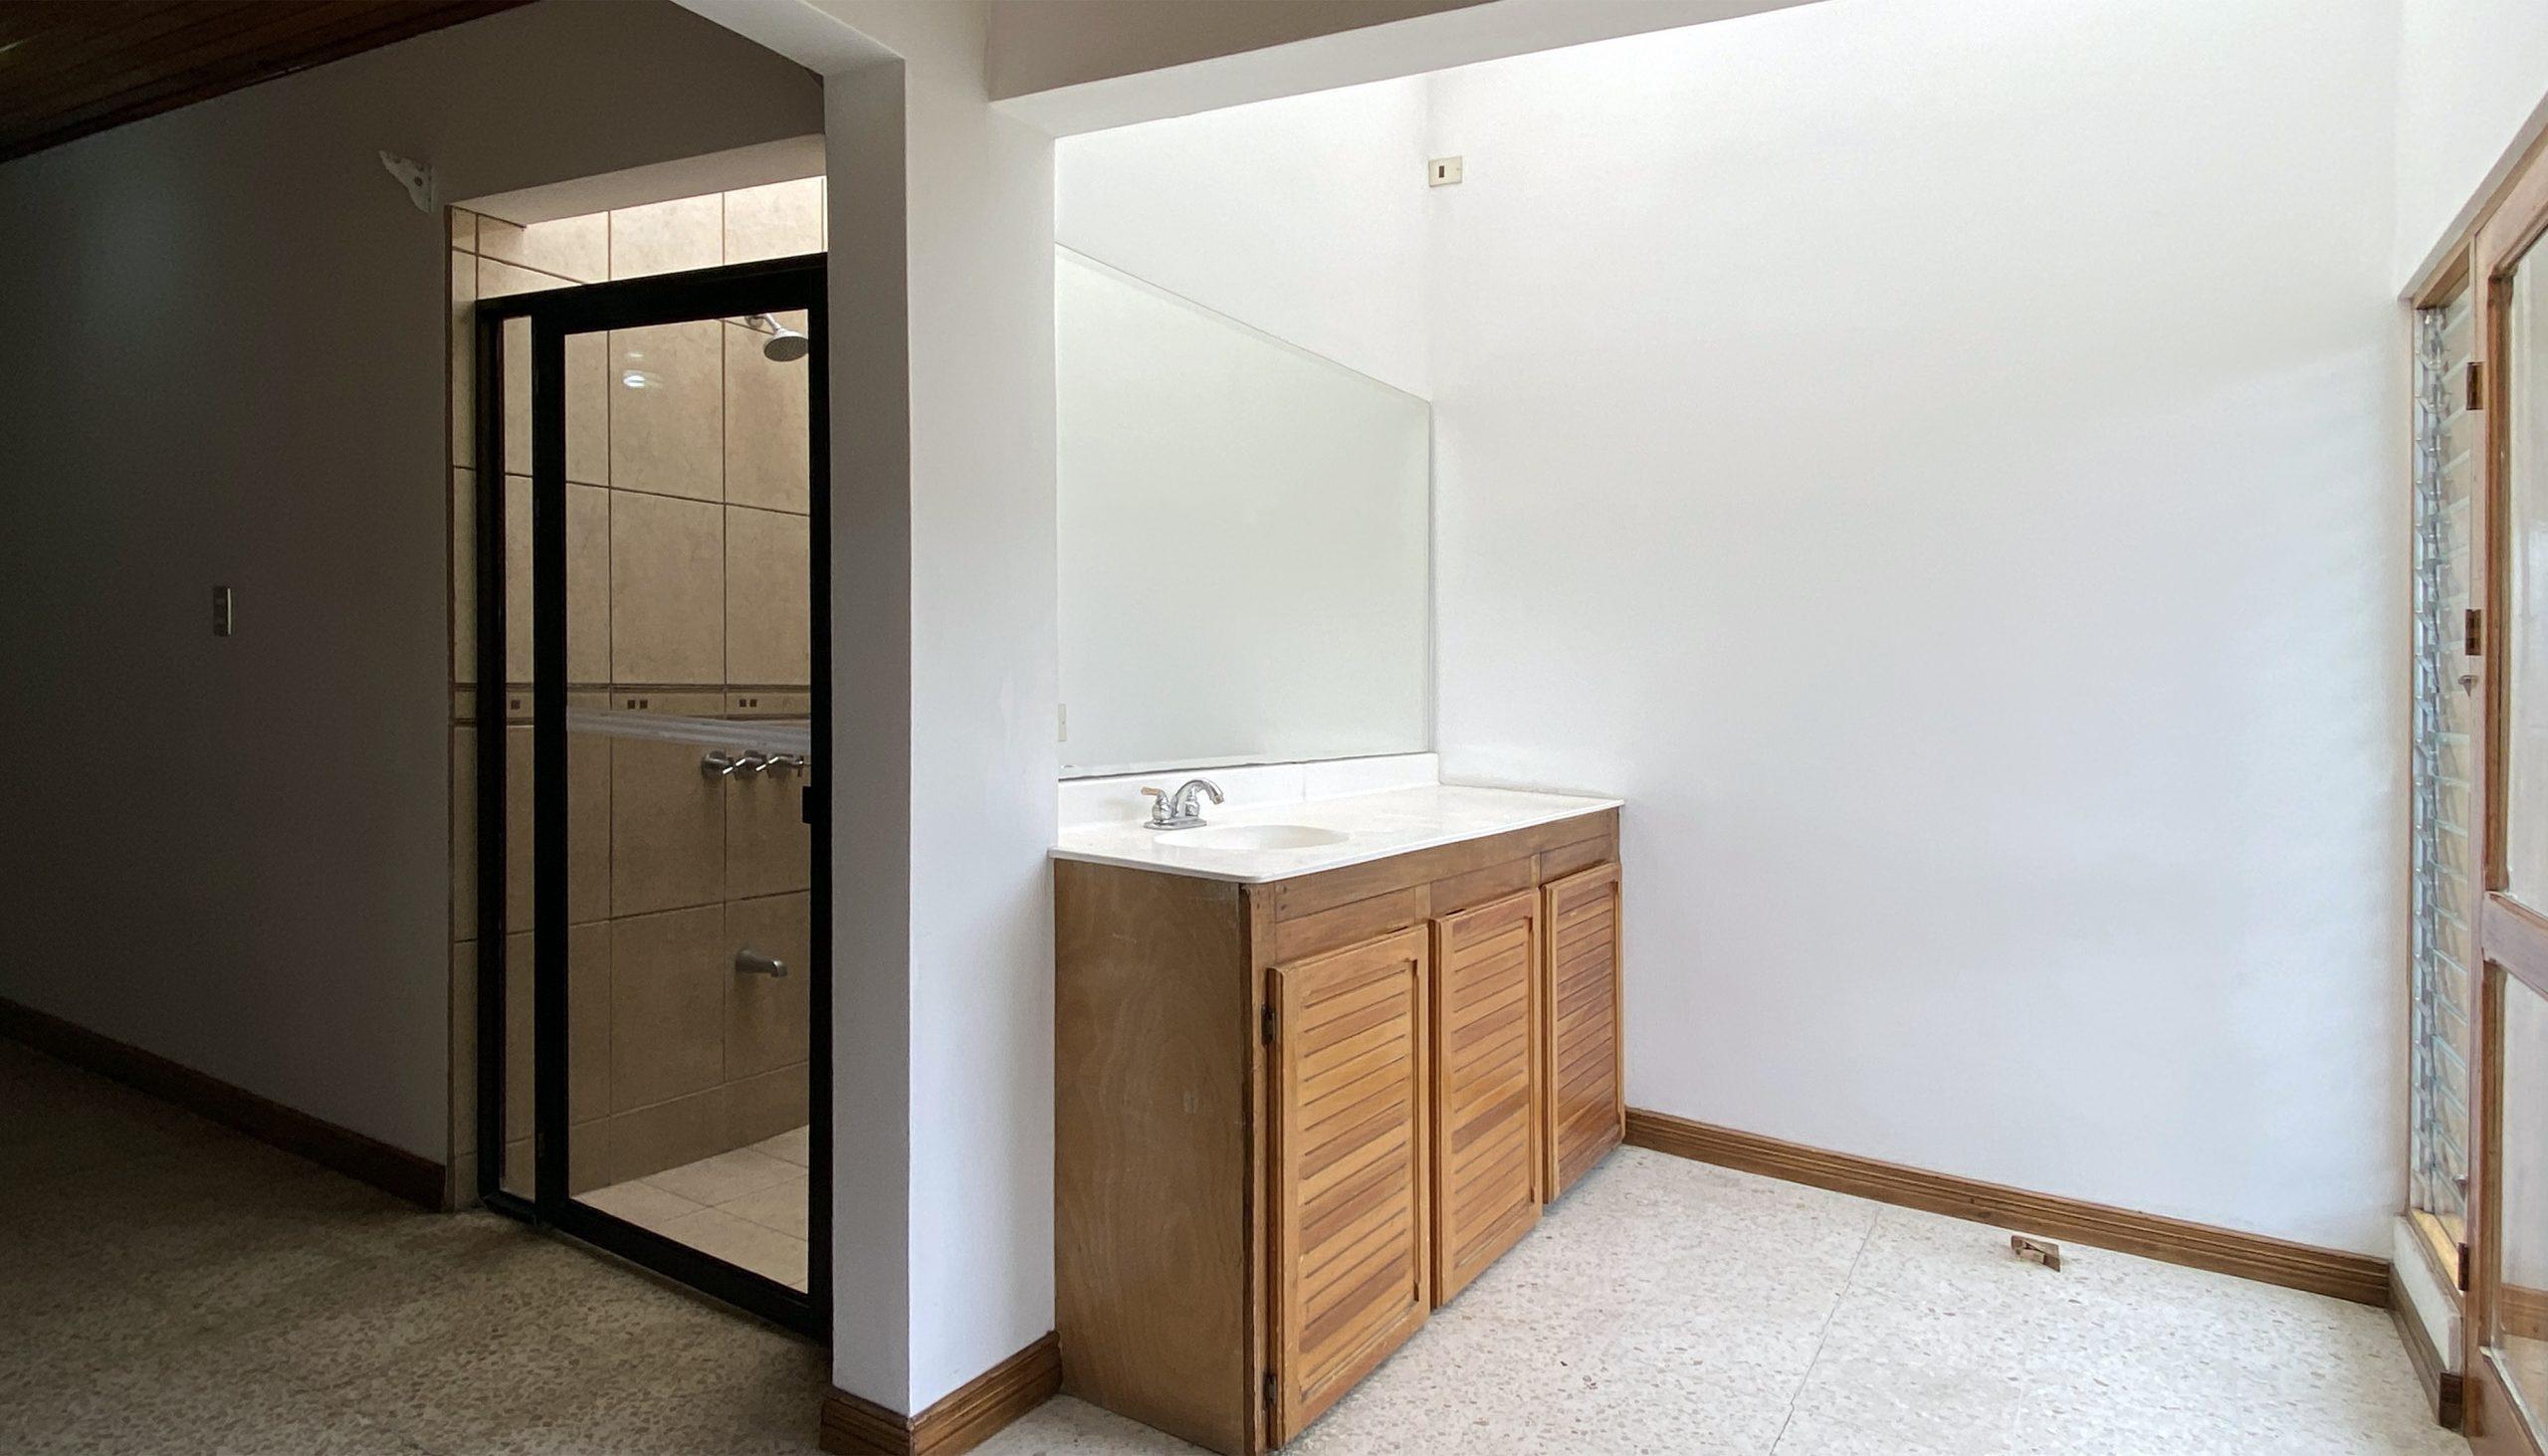 5 Bedroom House For Sale Escazú